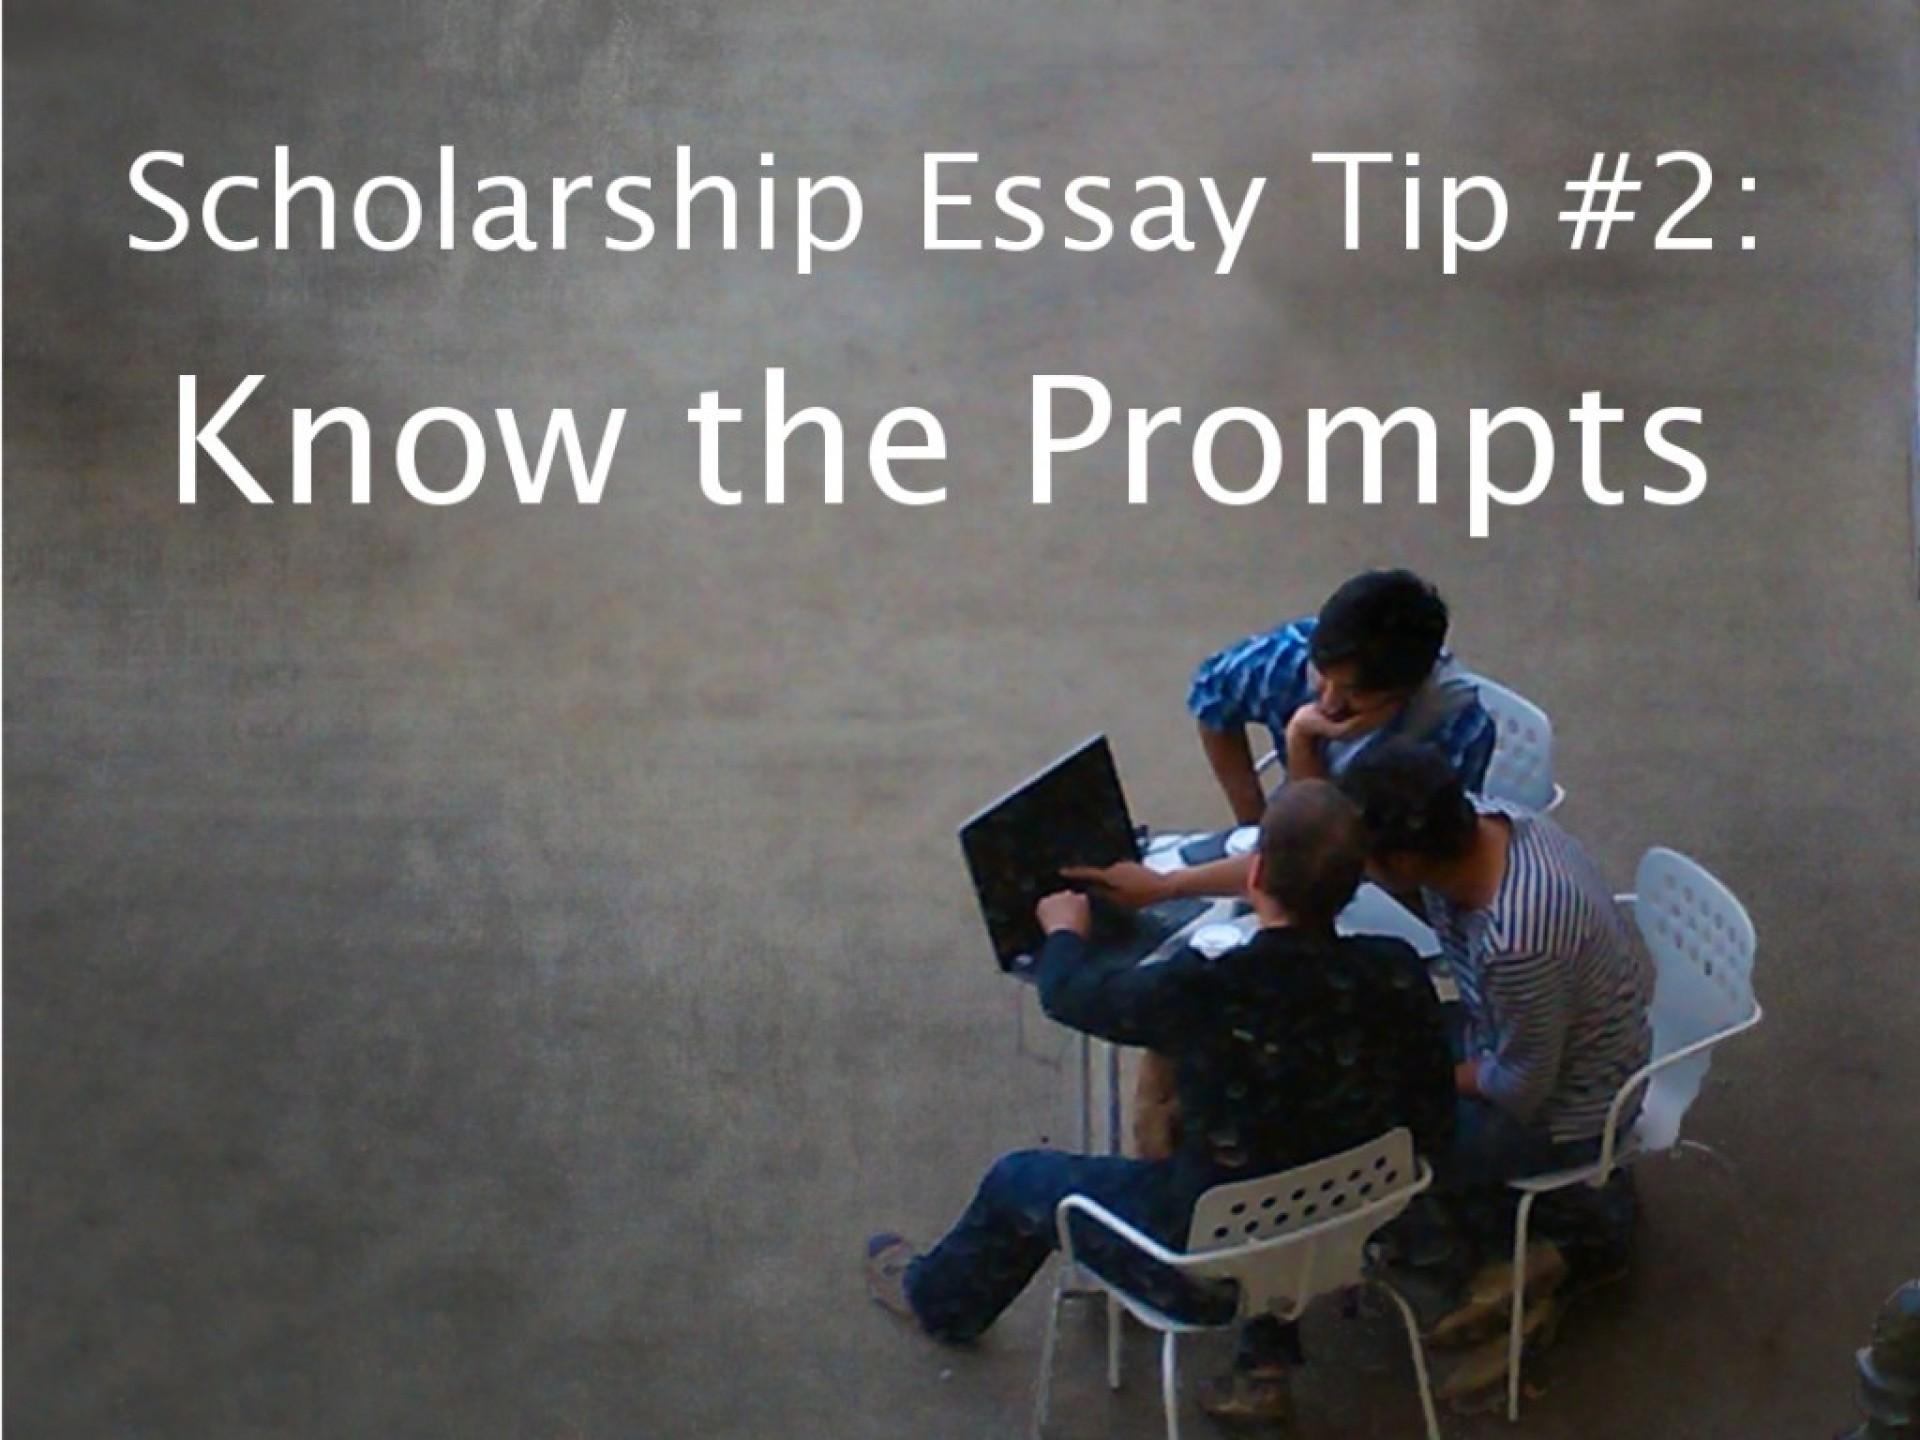 023 Scholarship Essay Prompts 2 Promptsresize10242c768ssl1 Magnificent Robertson 2018-19 Vanderbilt Washington And Lee Johnson 1920